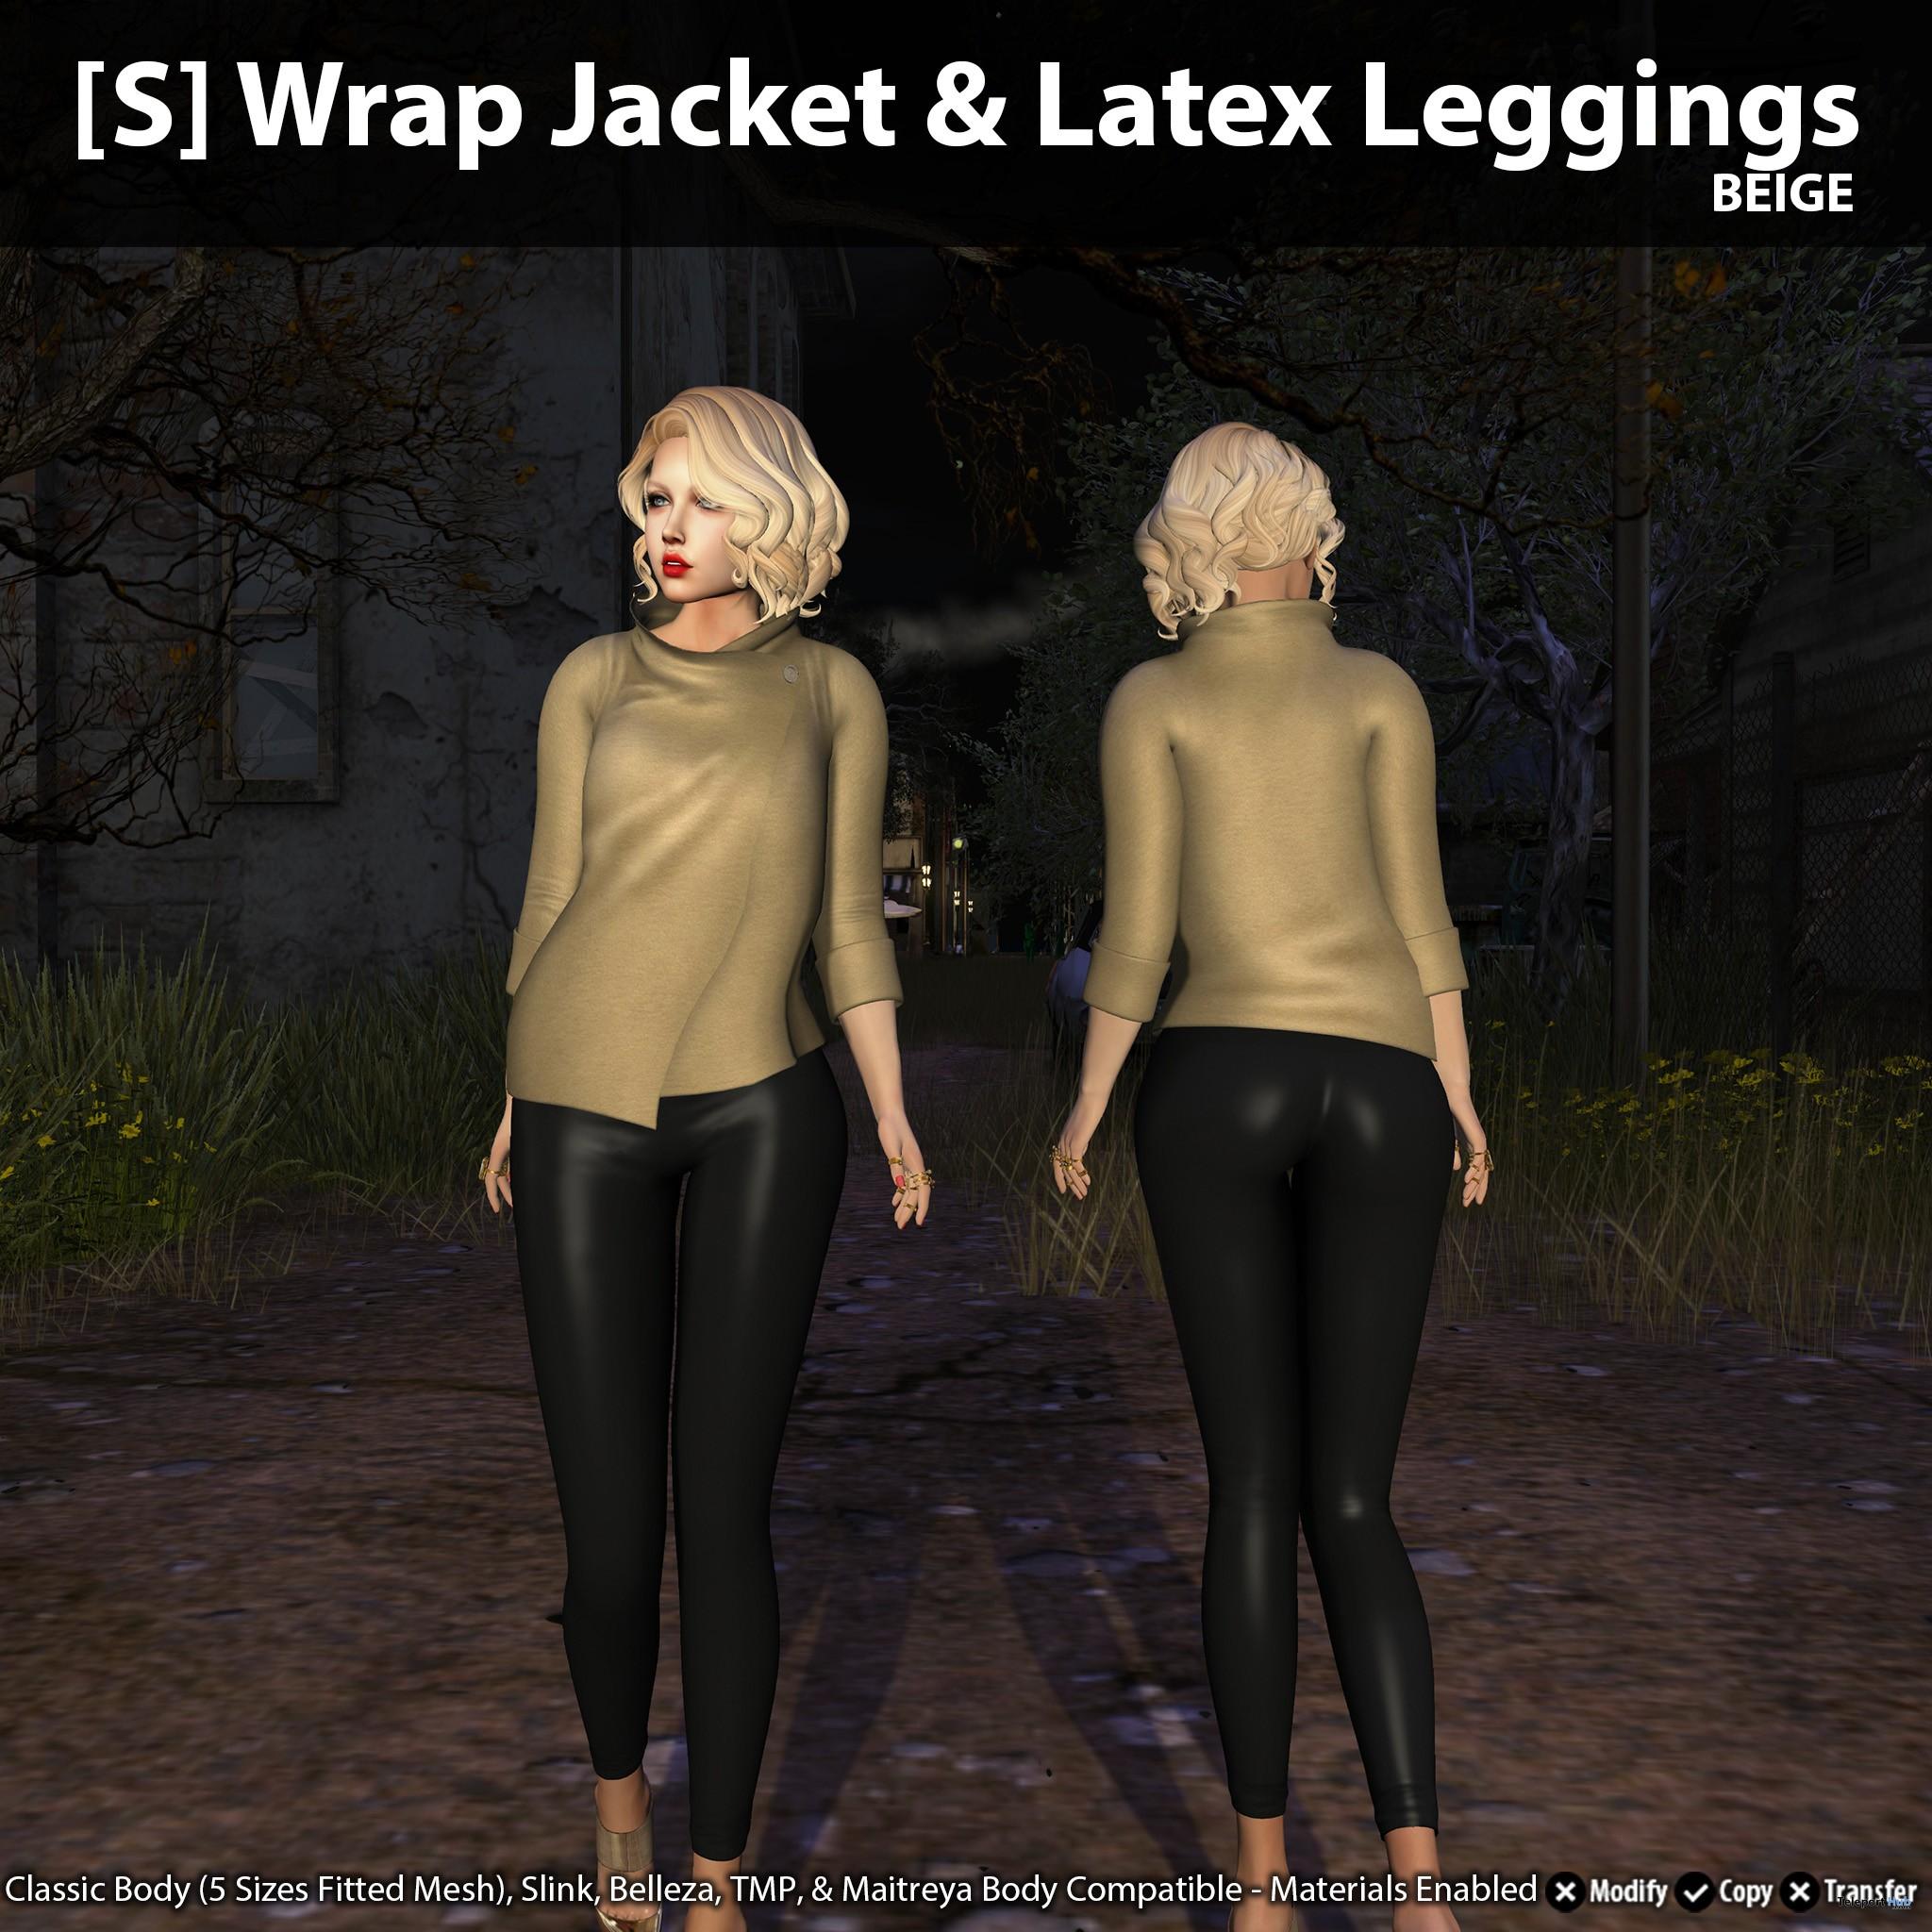 New Release: [S] Wrap Jacket & Latex Leggings by [satus Inc] - Teleport Hub - teleporthub.com